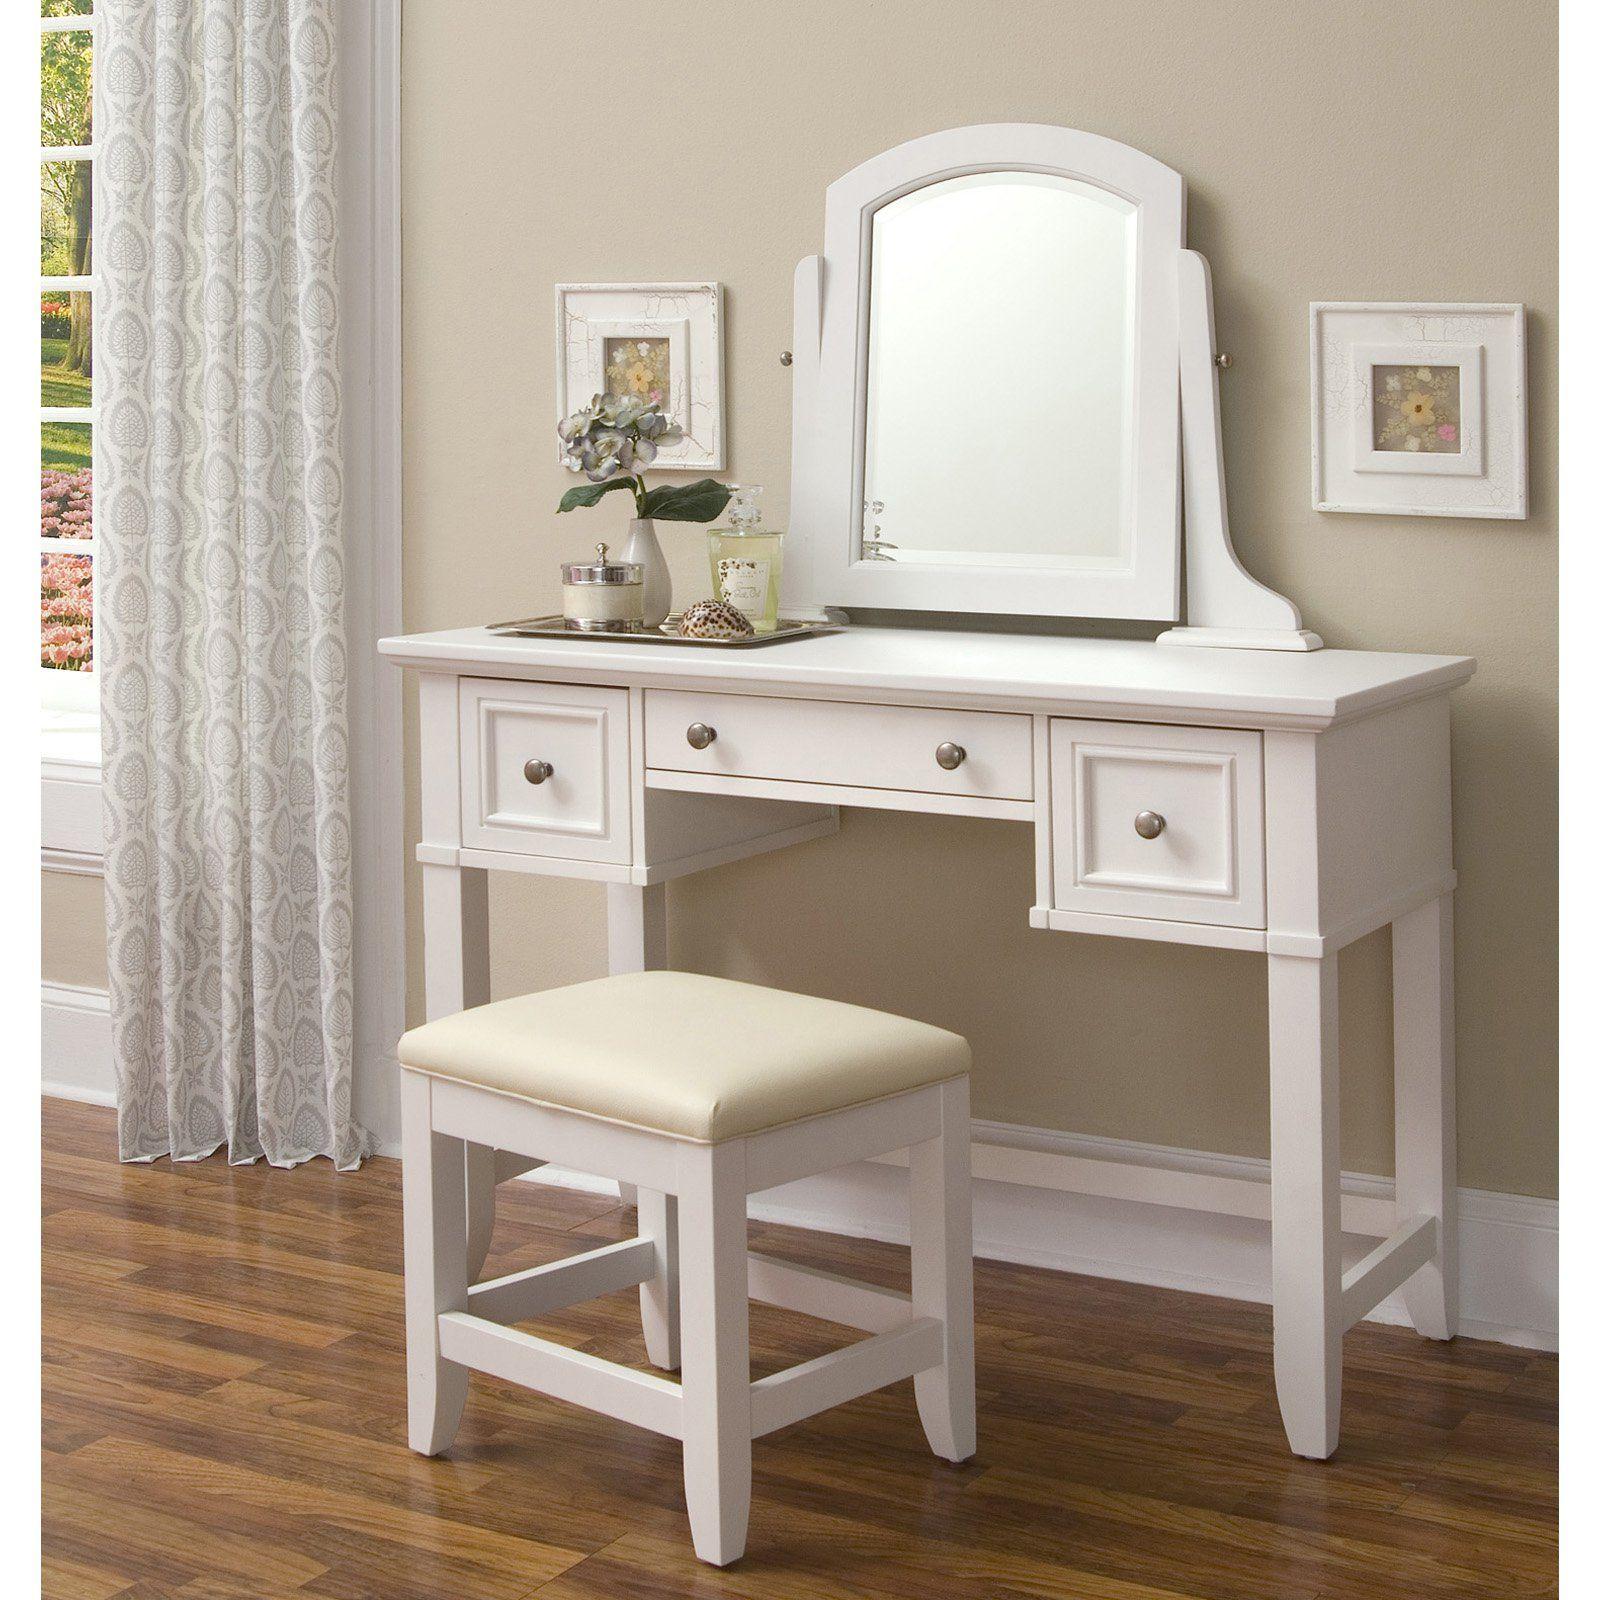 Merveilleux Home Styles Naples Bedroom Vanity Table   White   5530 70